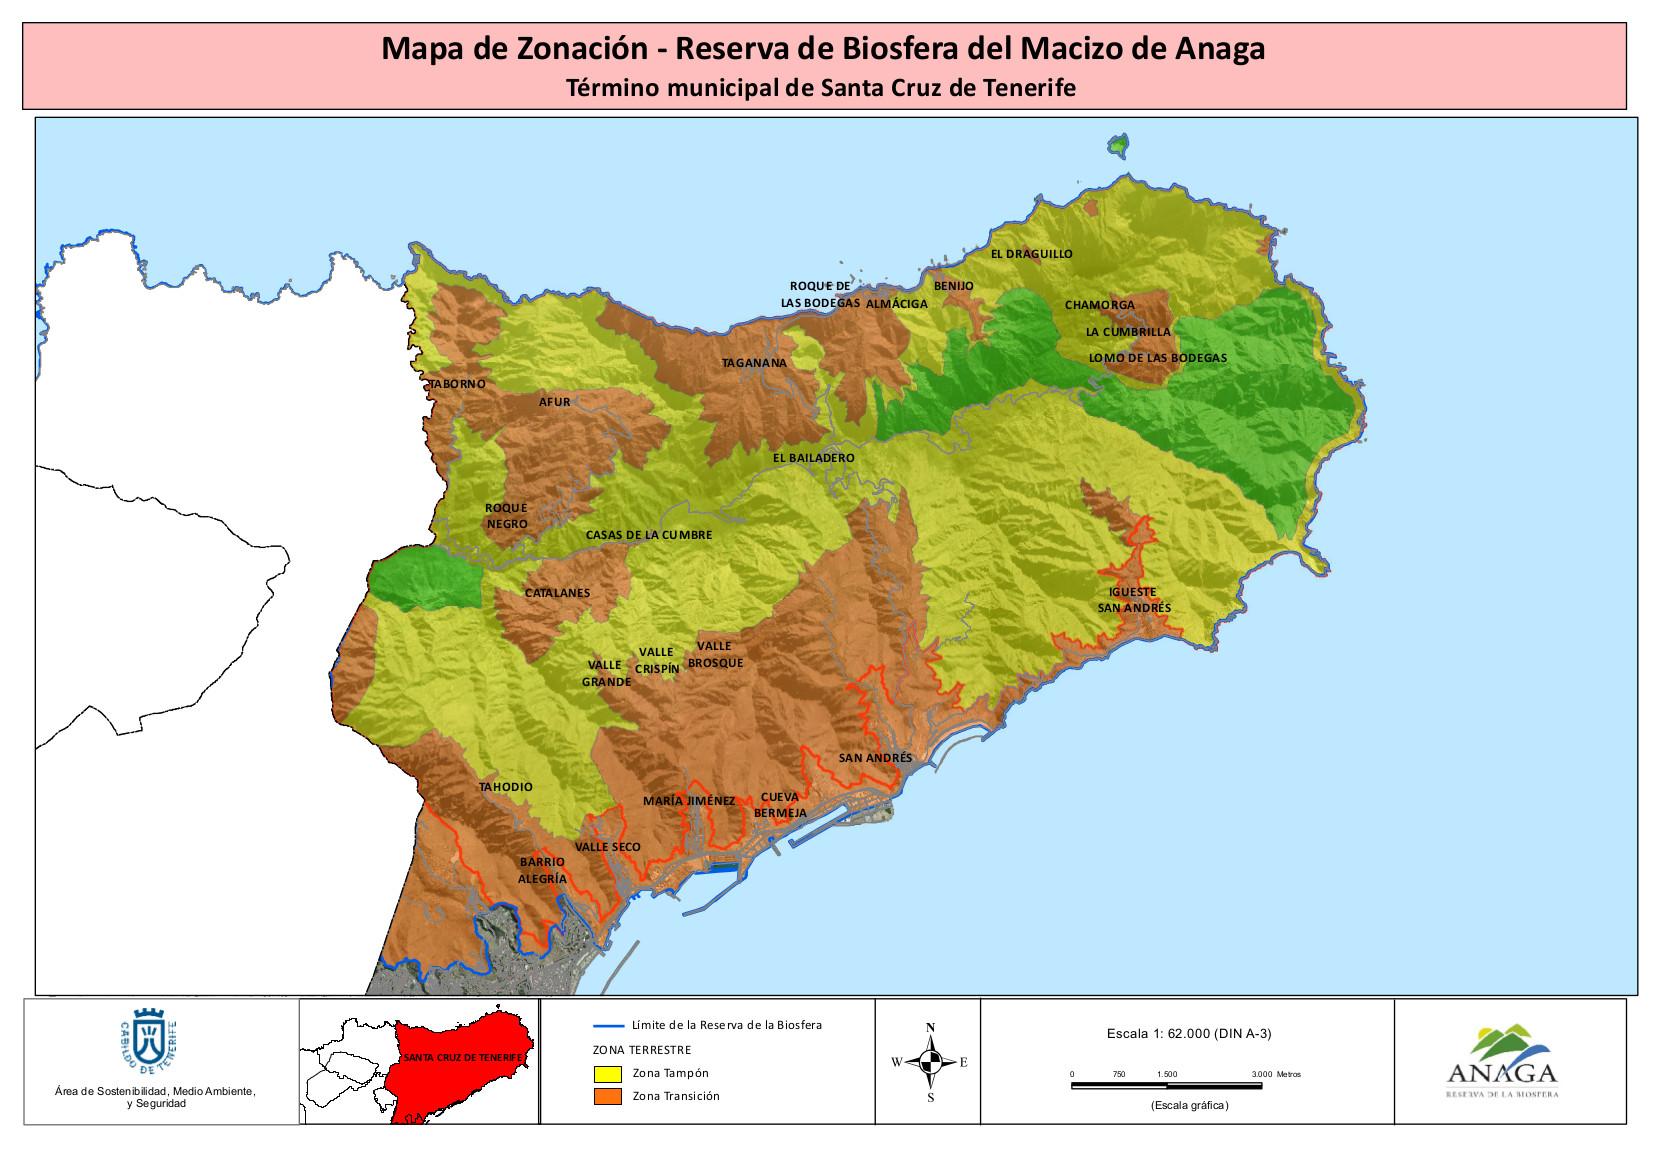 Mapa de Zonación Reserva de la Biofera del Macizo de Anaga - Término Municipal de Santa Cruz